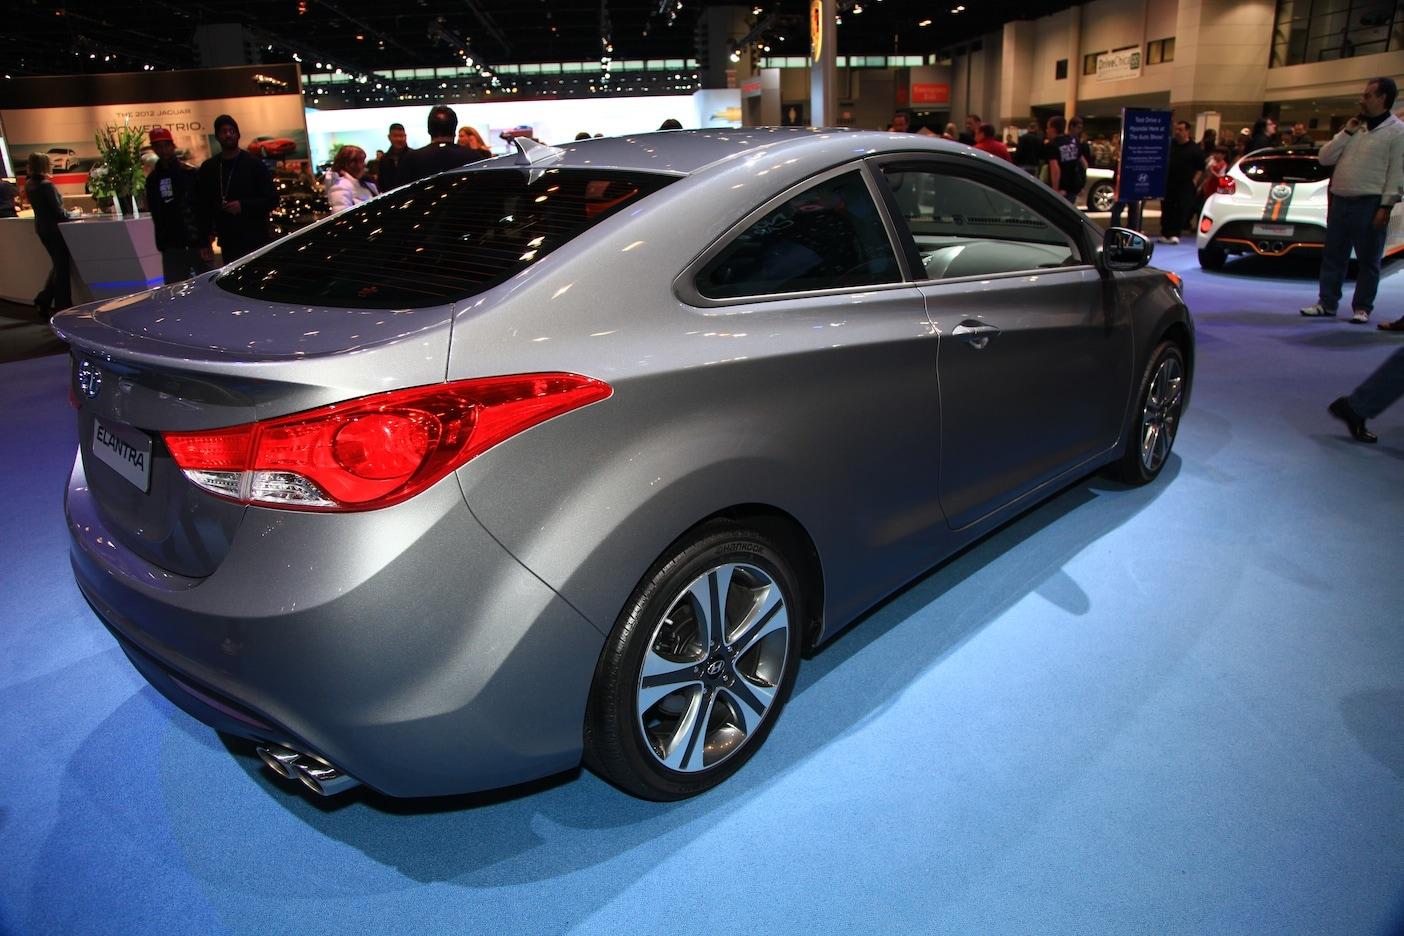 Toyota Cars For Sale Matteson Auto Mall